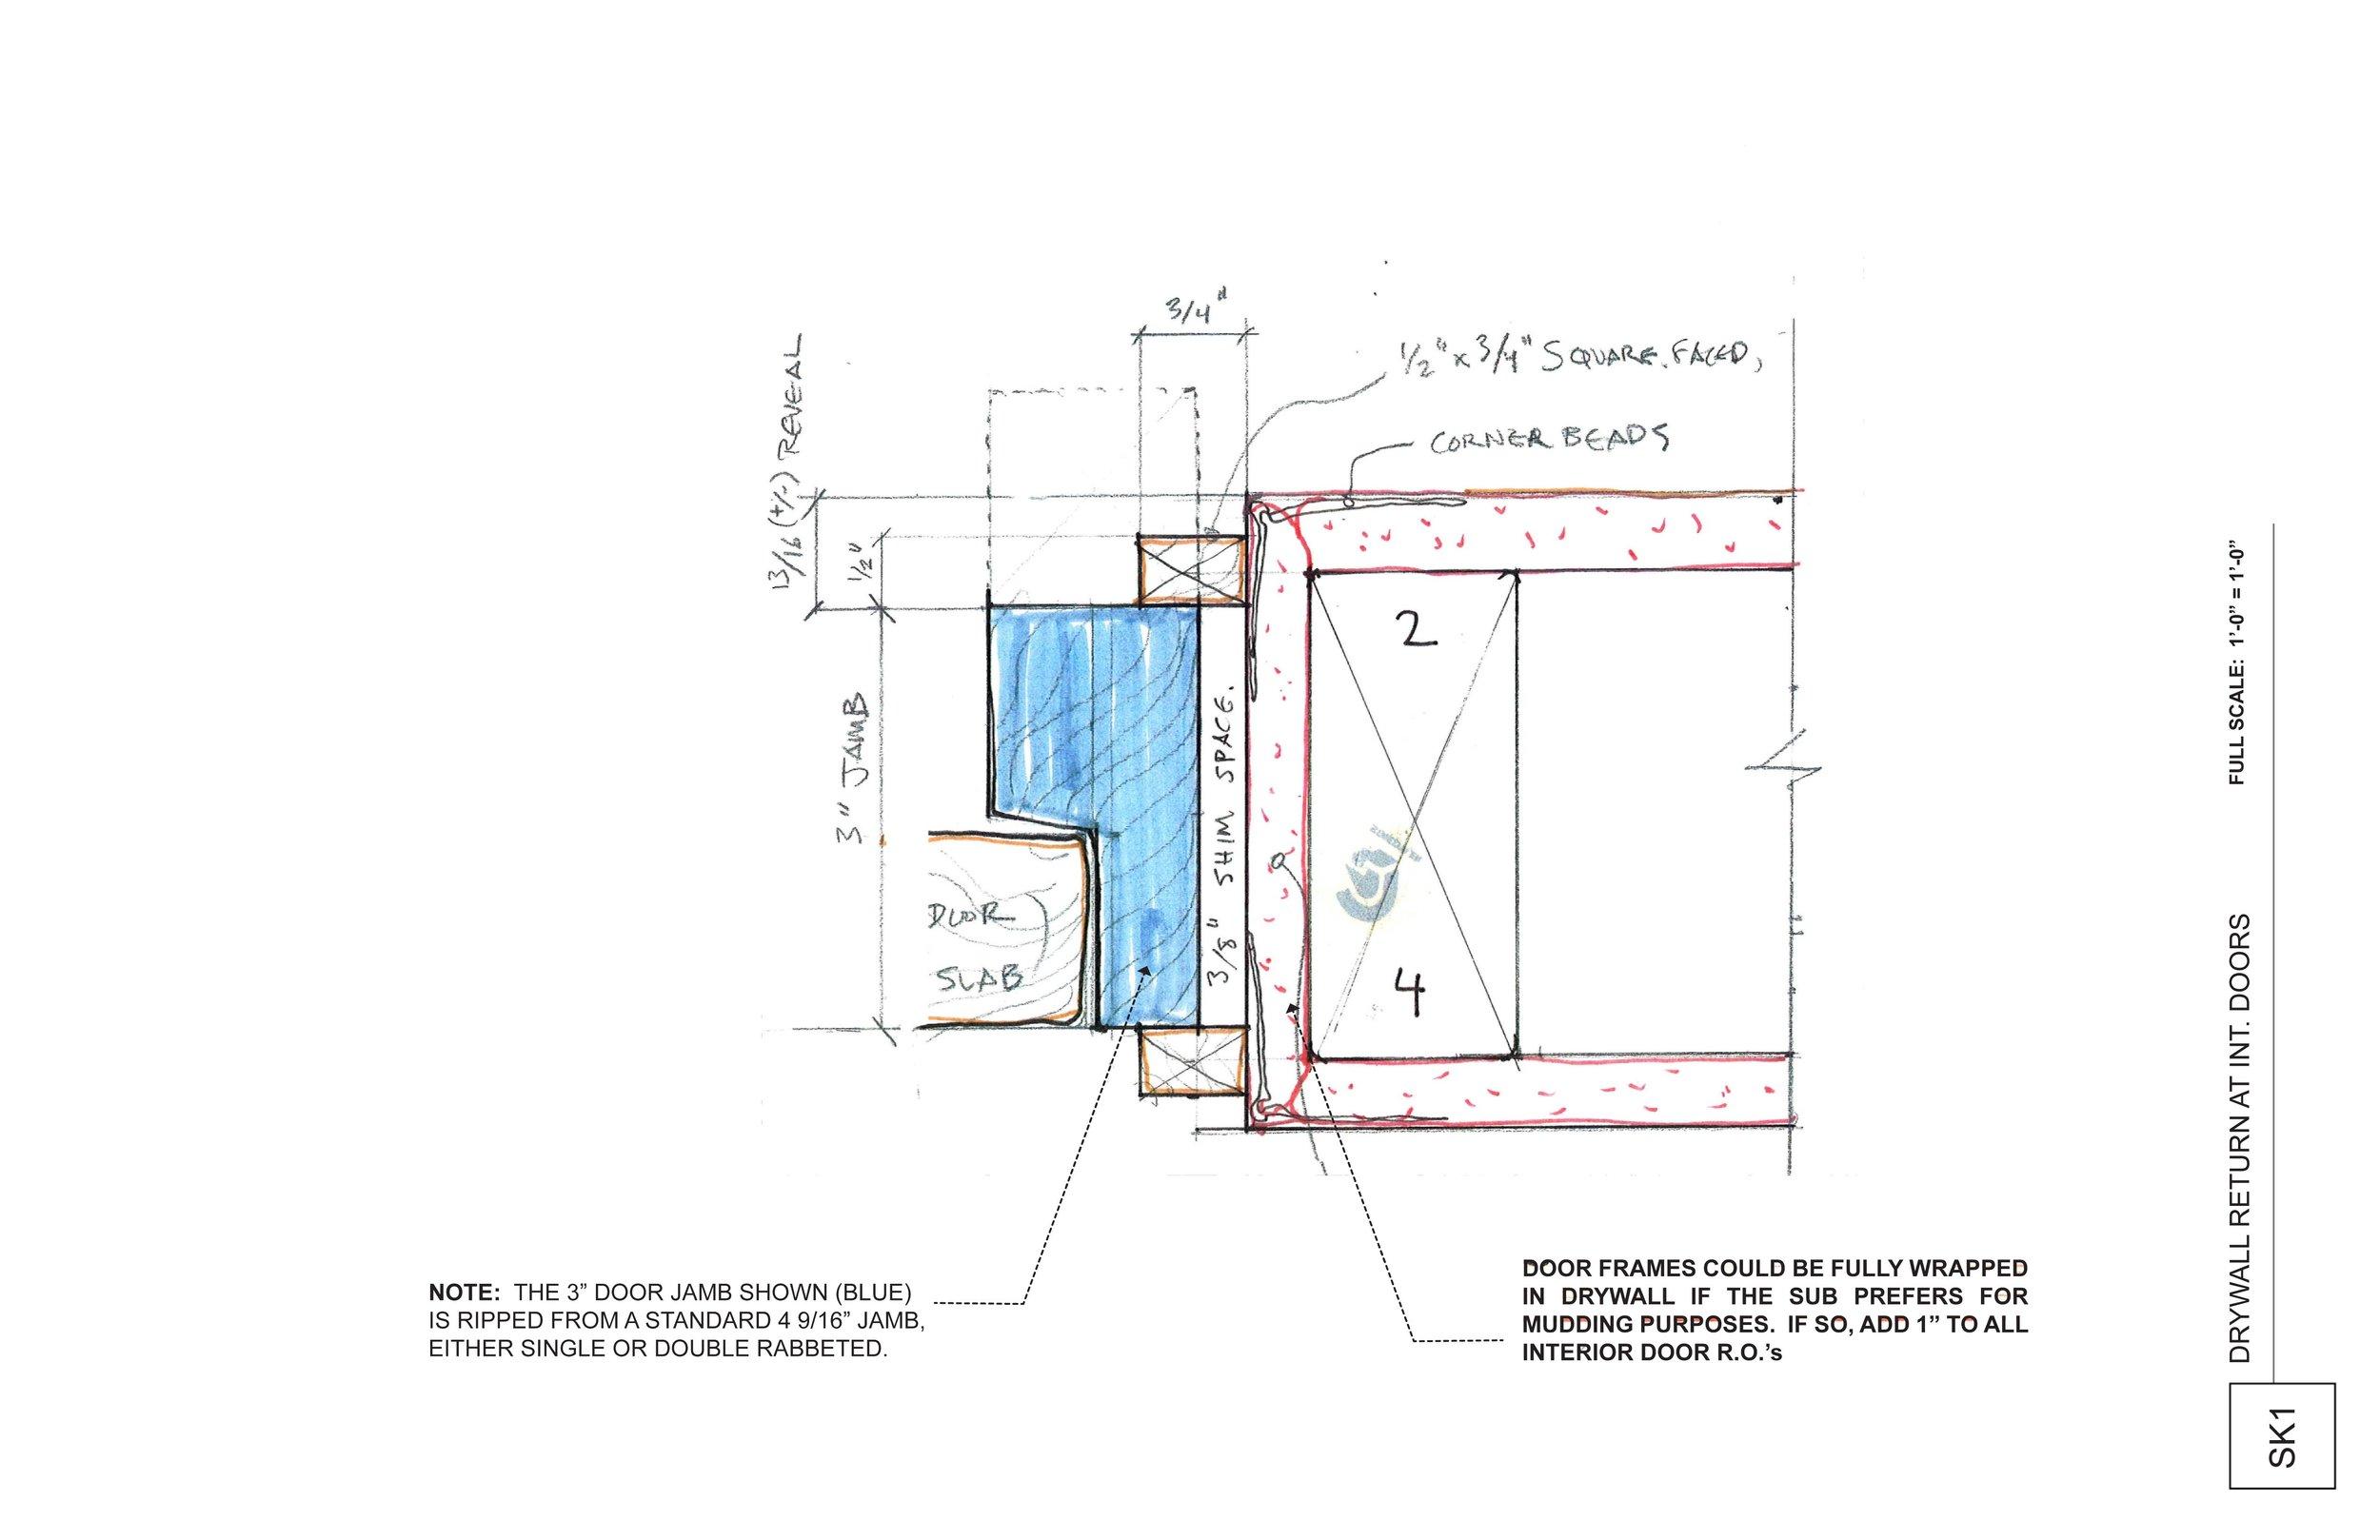 1127_SK1-5_DrywallDetials-4b.jpg